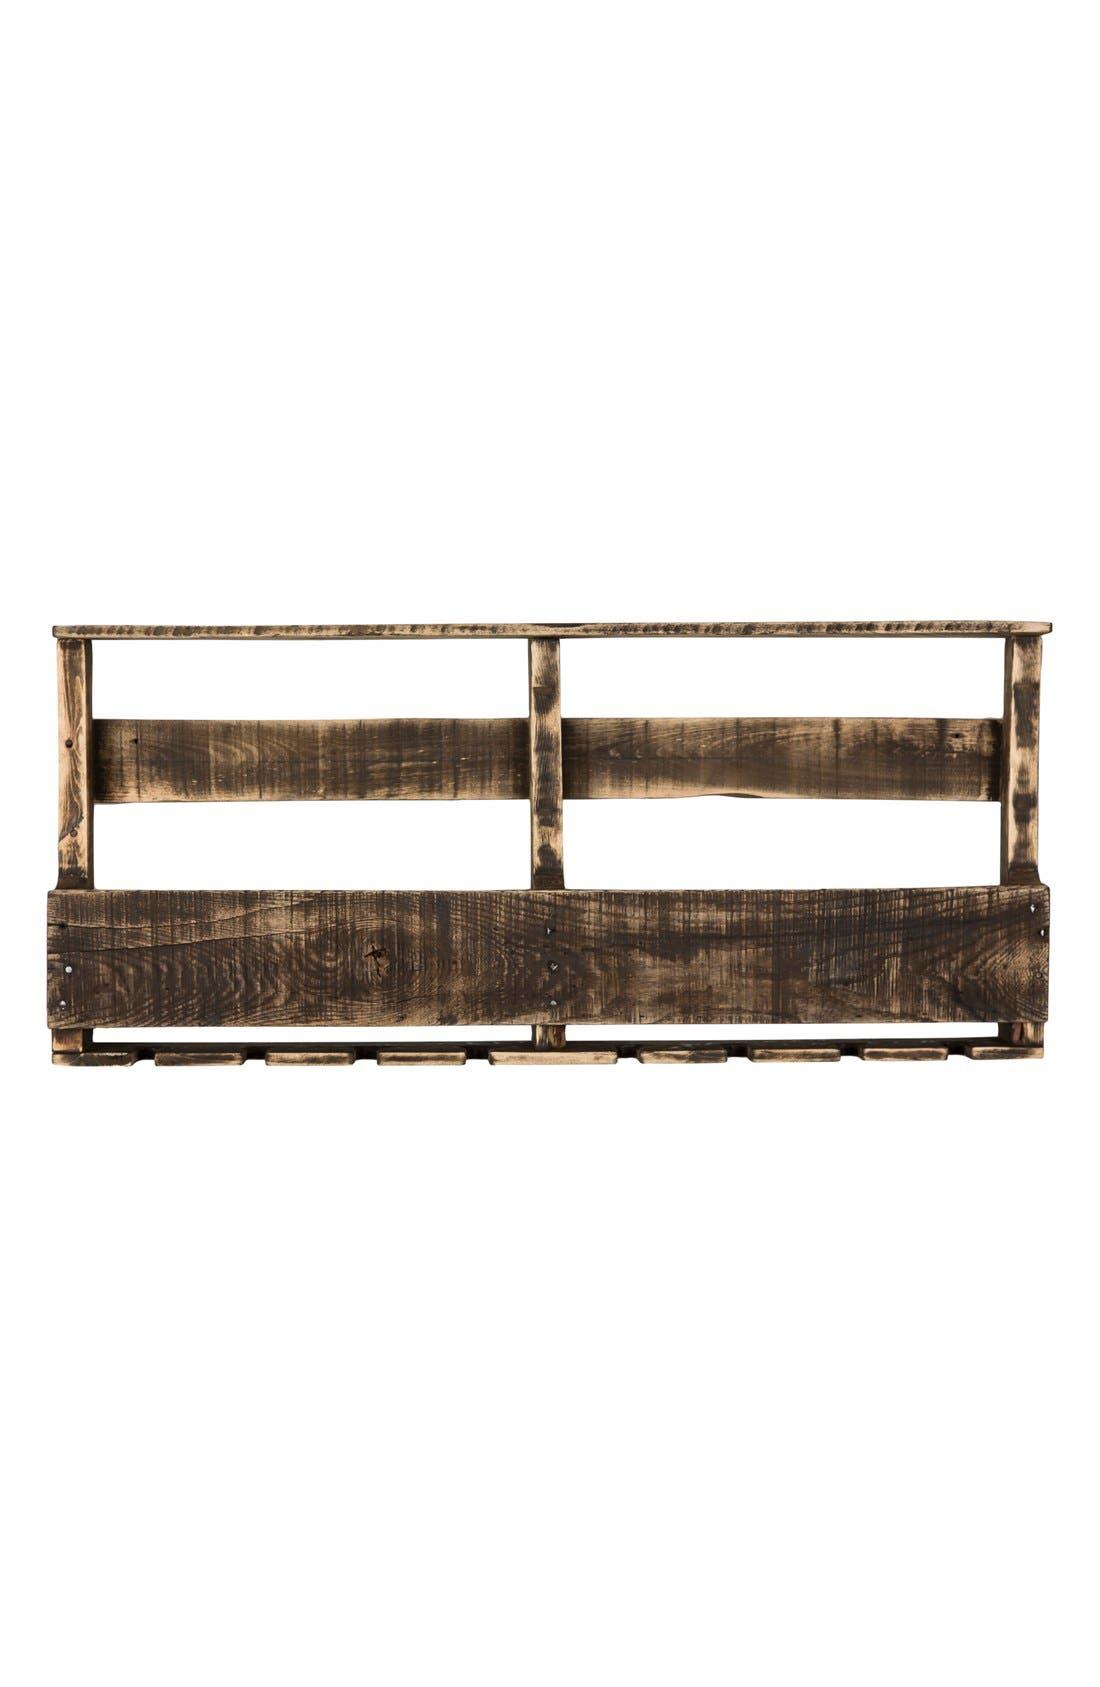 (del) Hutson Designs 'Top Shelf' RepurposedWood Wine Rack,                         Main,                         color, Darkwalnut Distressed